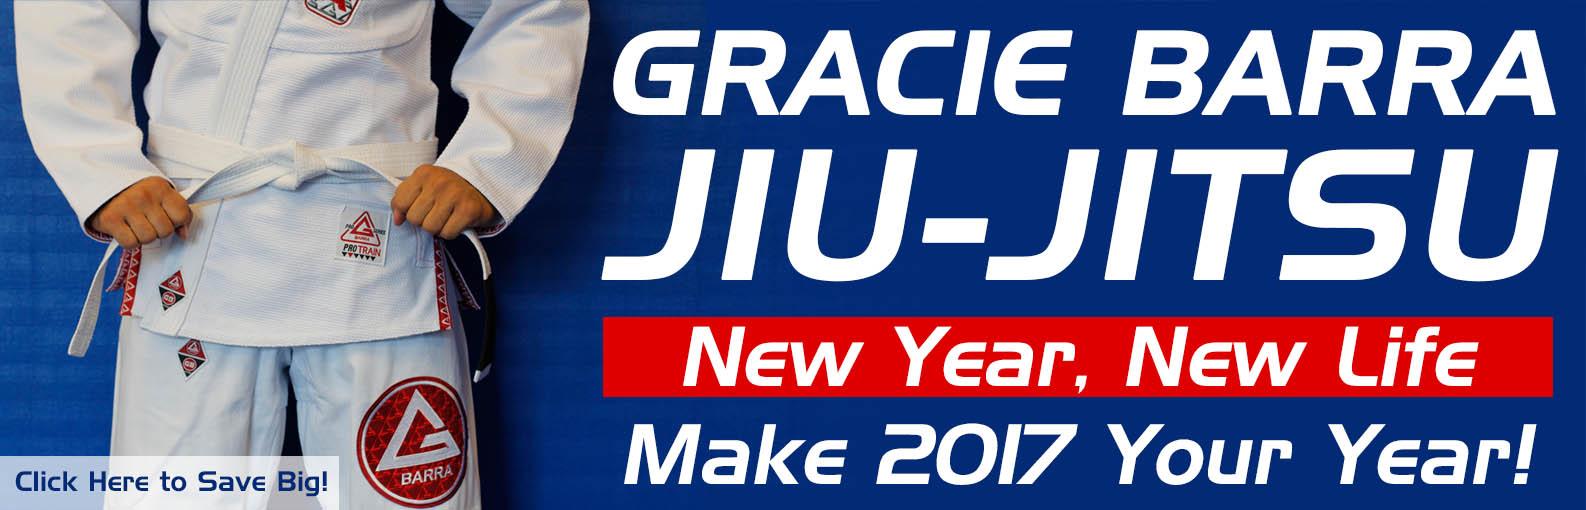 gracie barra, gracie jiu jitsu, gracie bjj, brazilian jiu jitsu, bjj, jiu jitsu, martial arts, gb mansfield, karate